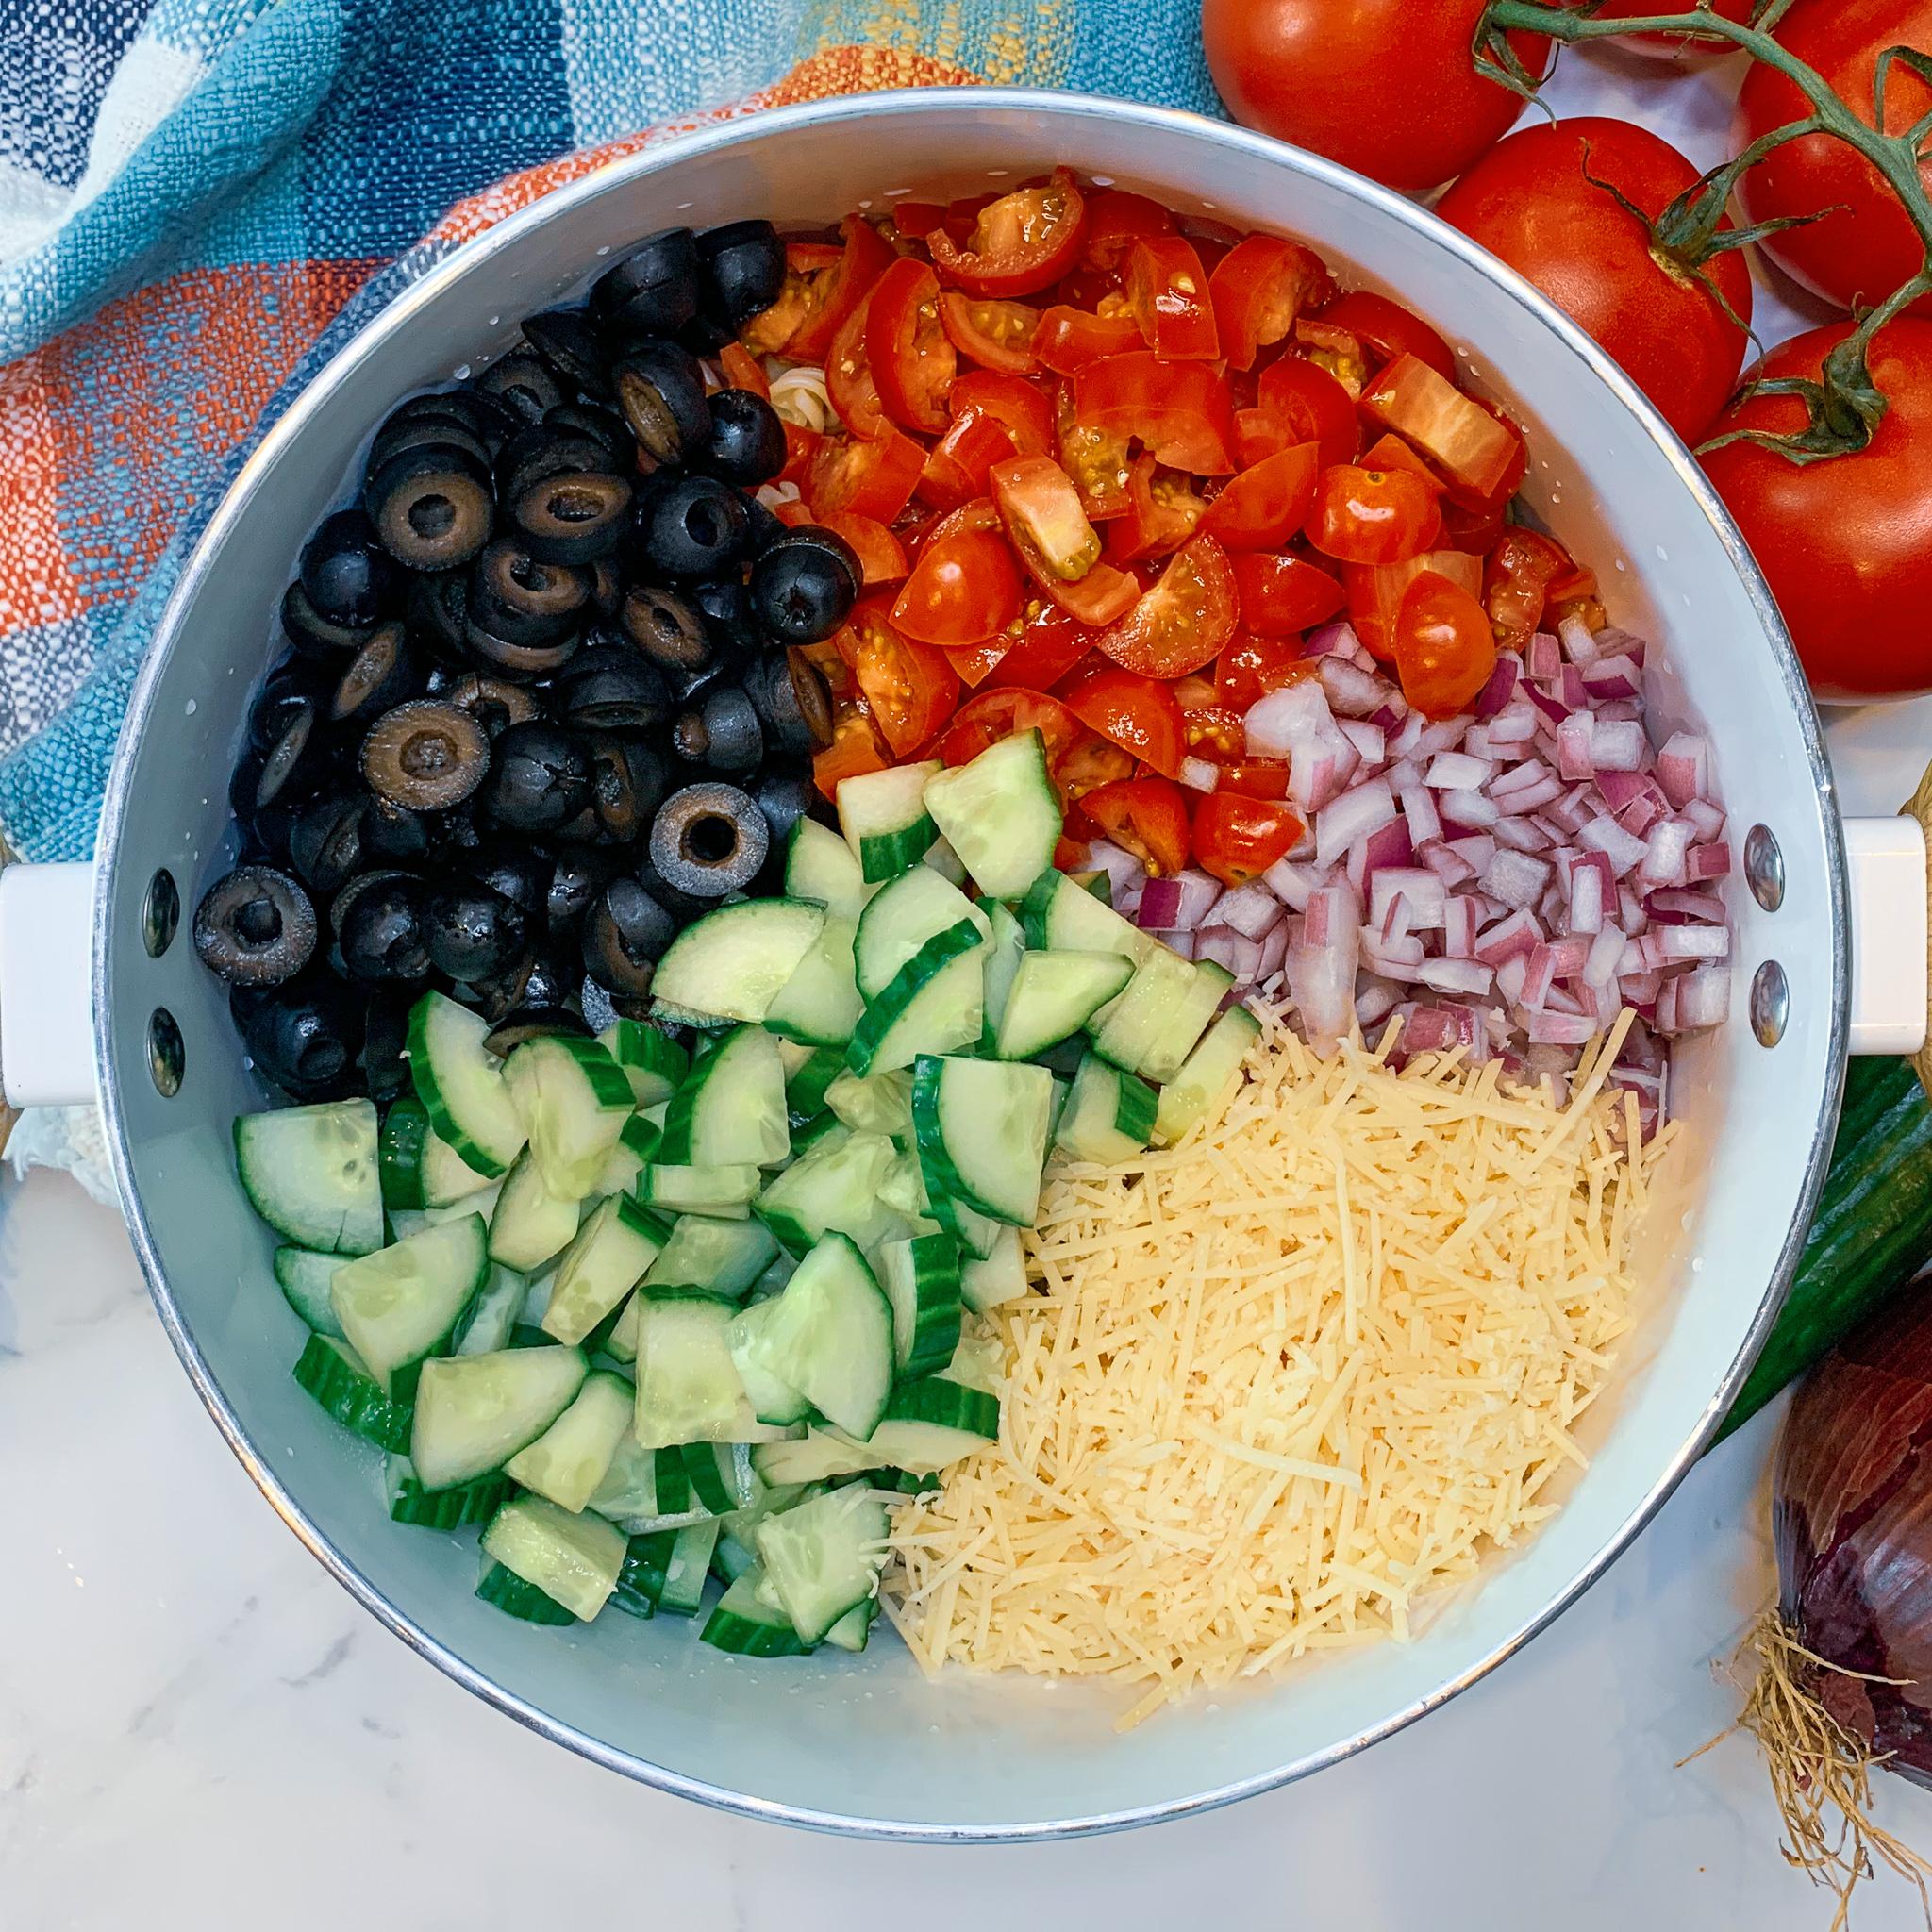 chopped veggies and cheese